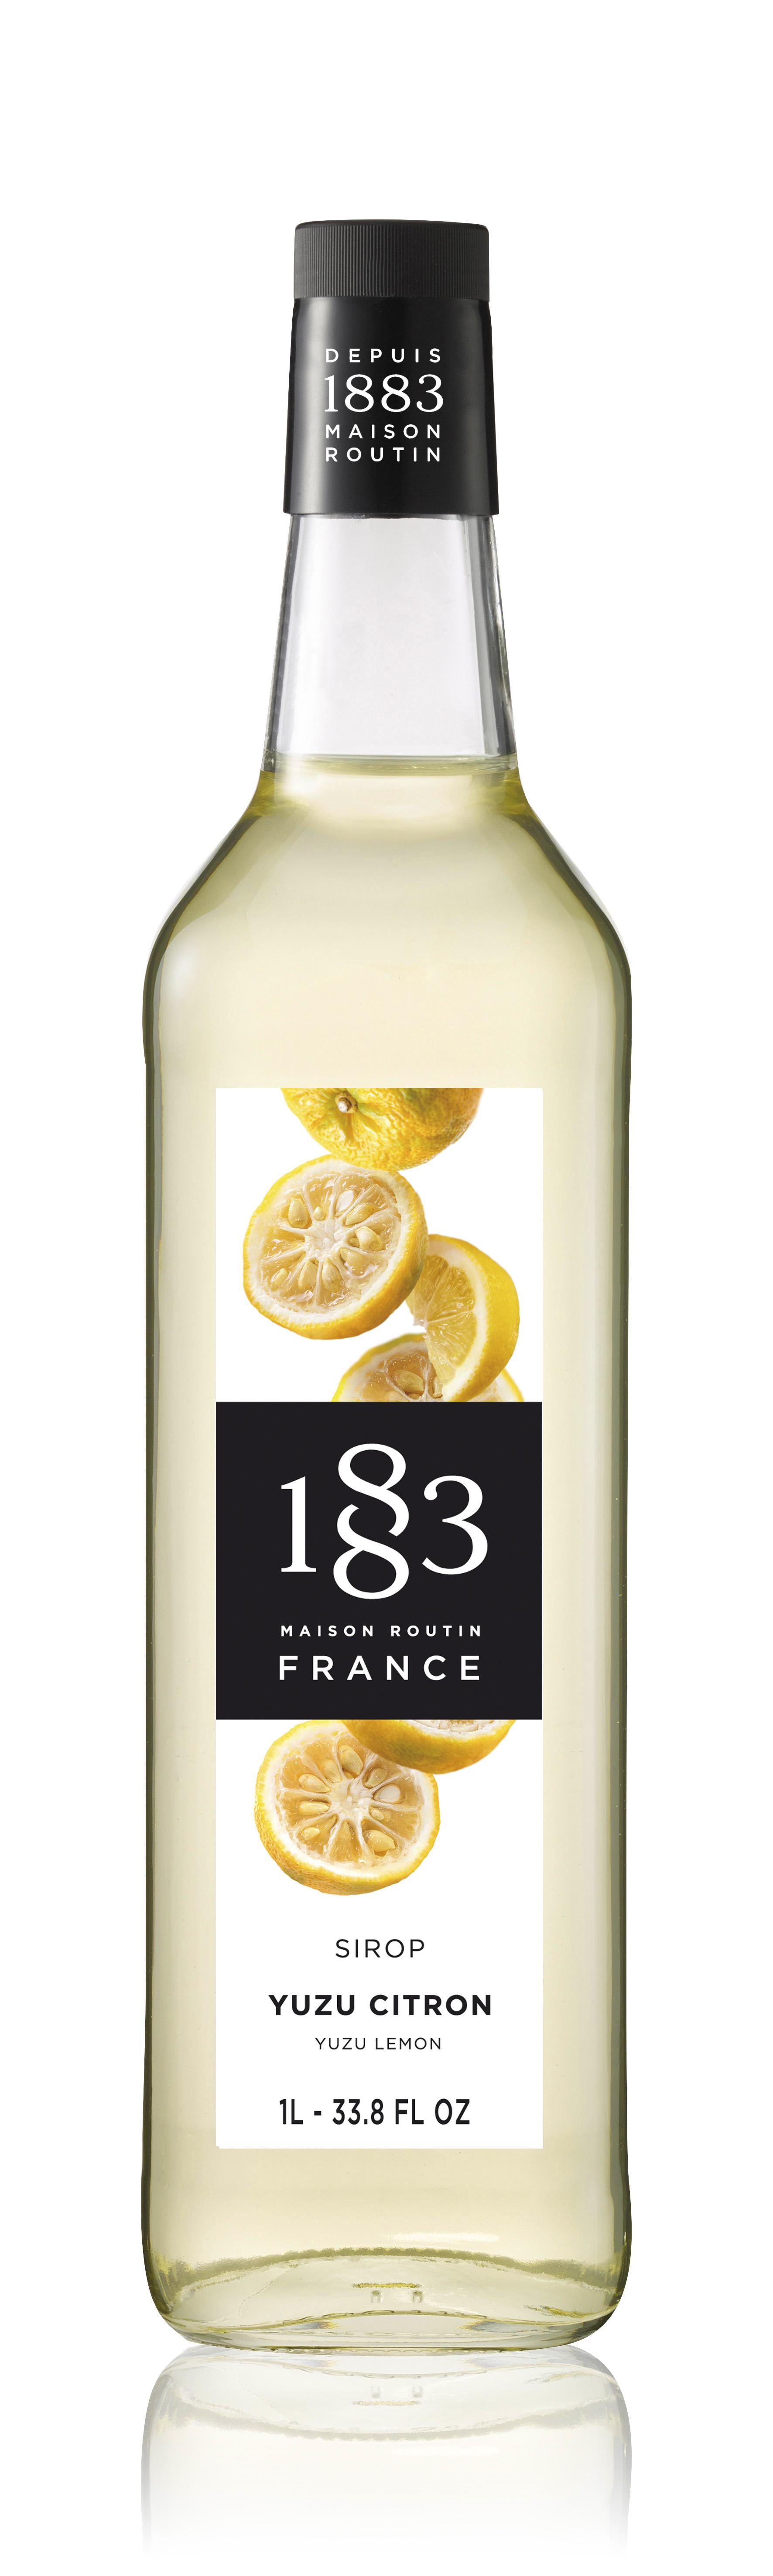 1883 Syrup Yuzu Lemon 1L Glass Bottle